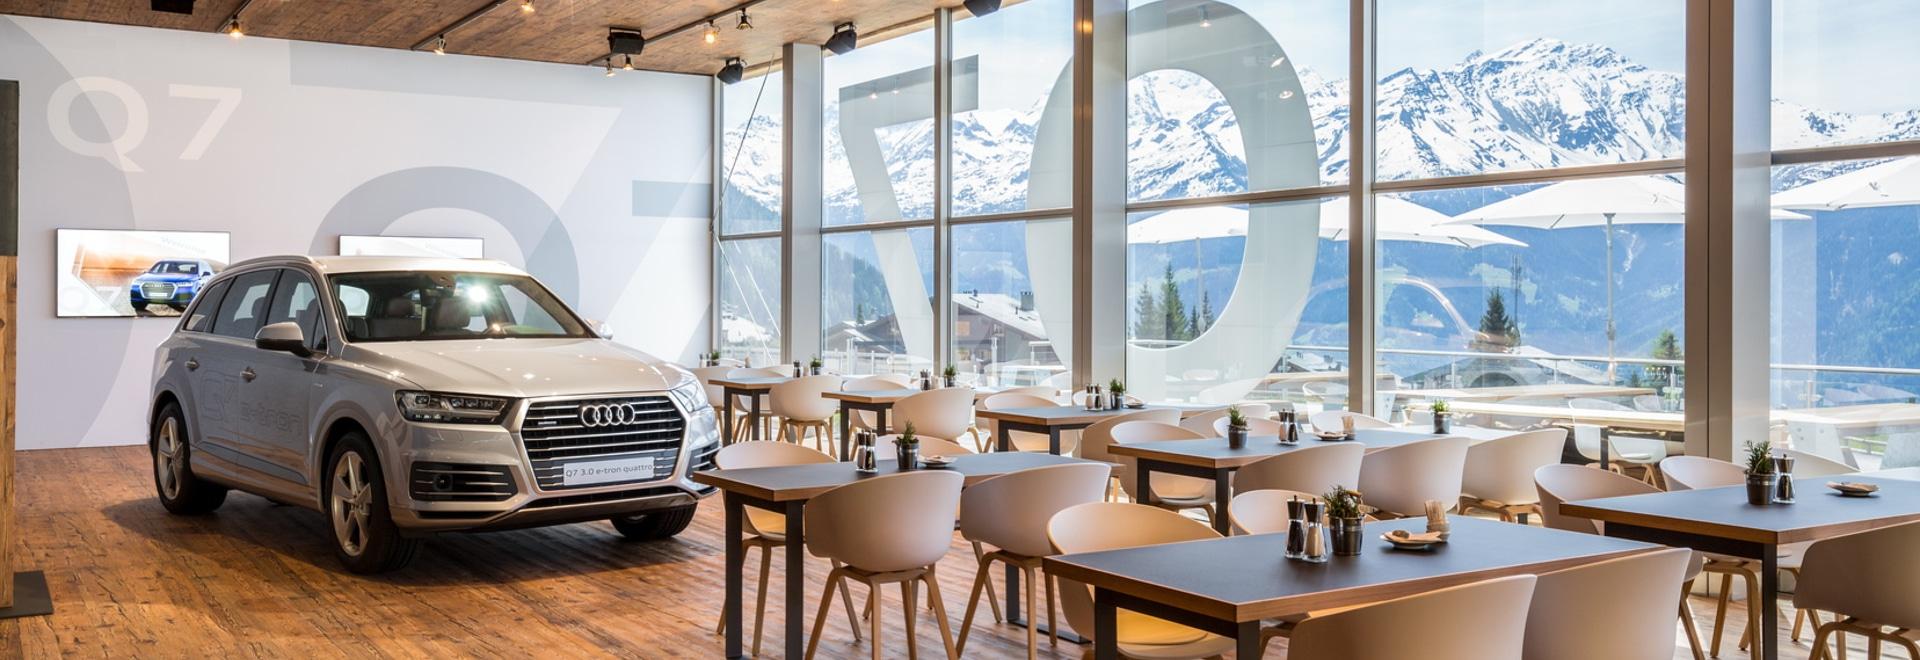 Presentation Audi Q7 2015